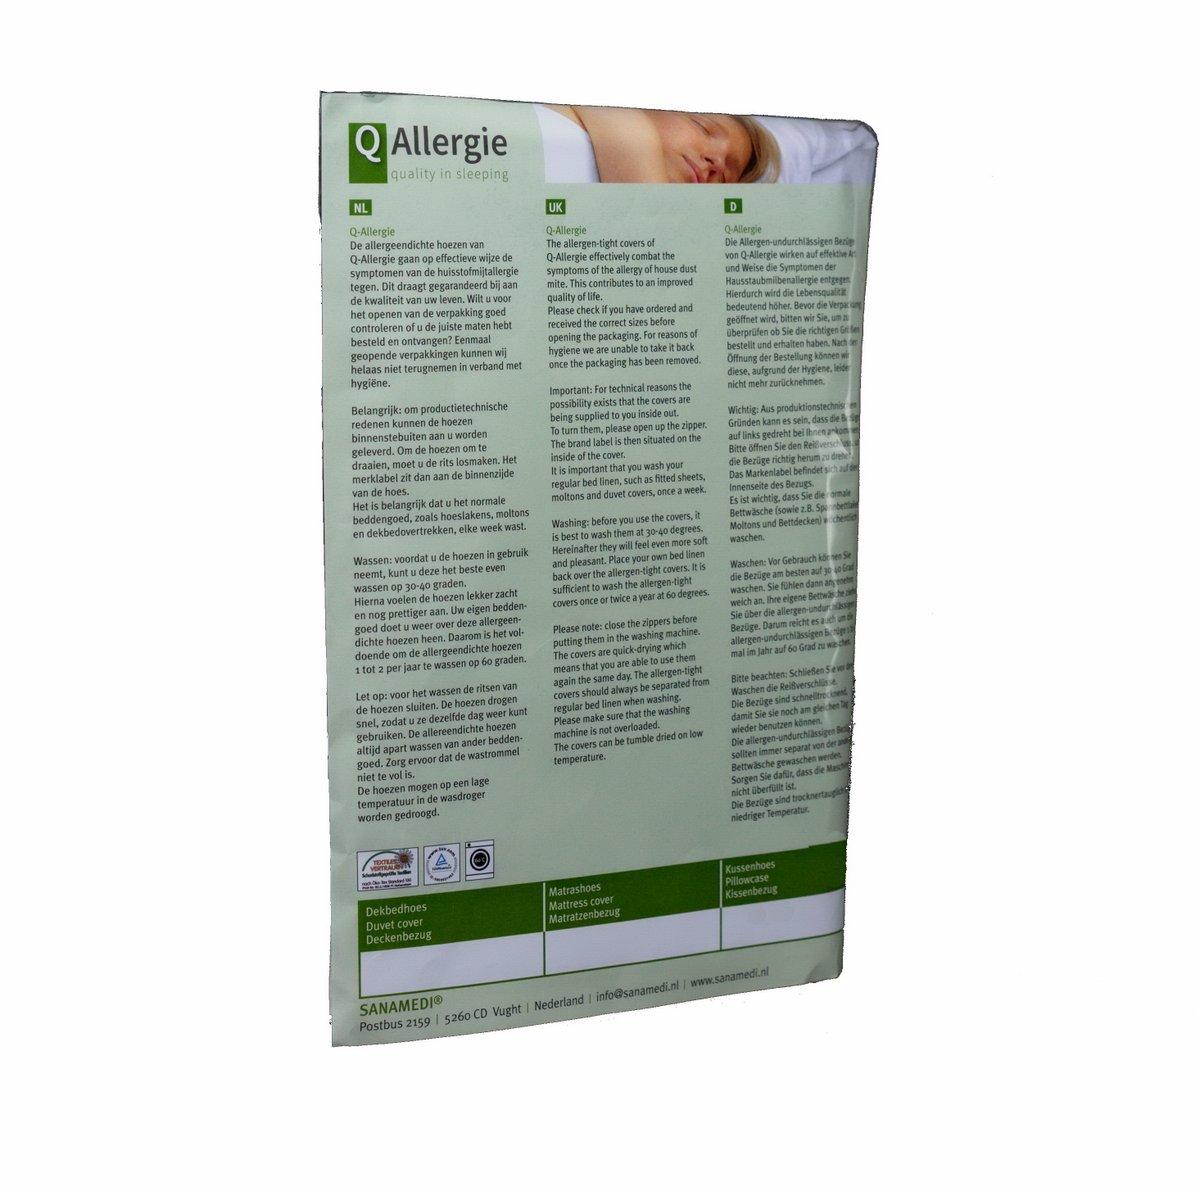 Kussenhoes Q-Allergie 60 x 70 cm | Anti allergie kussenhoes